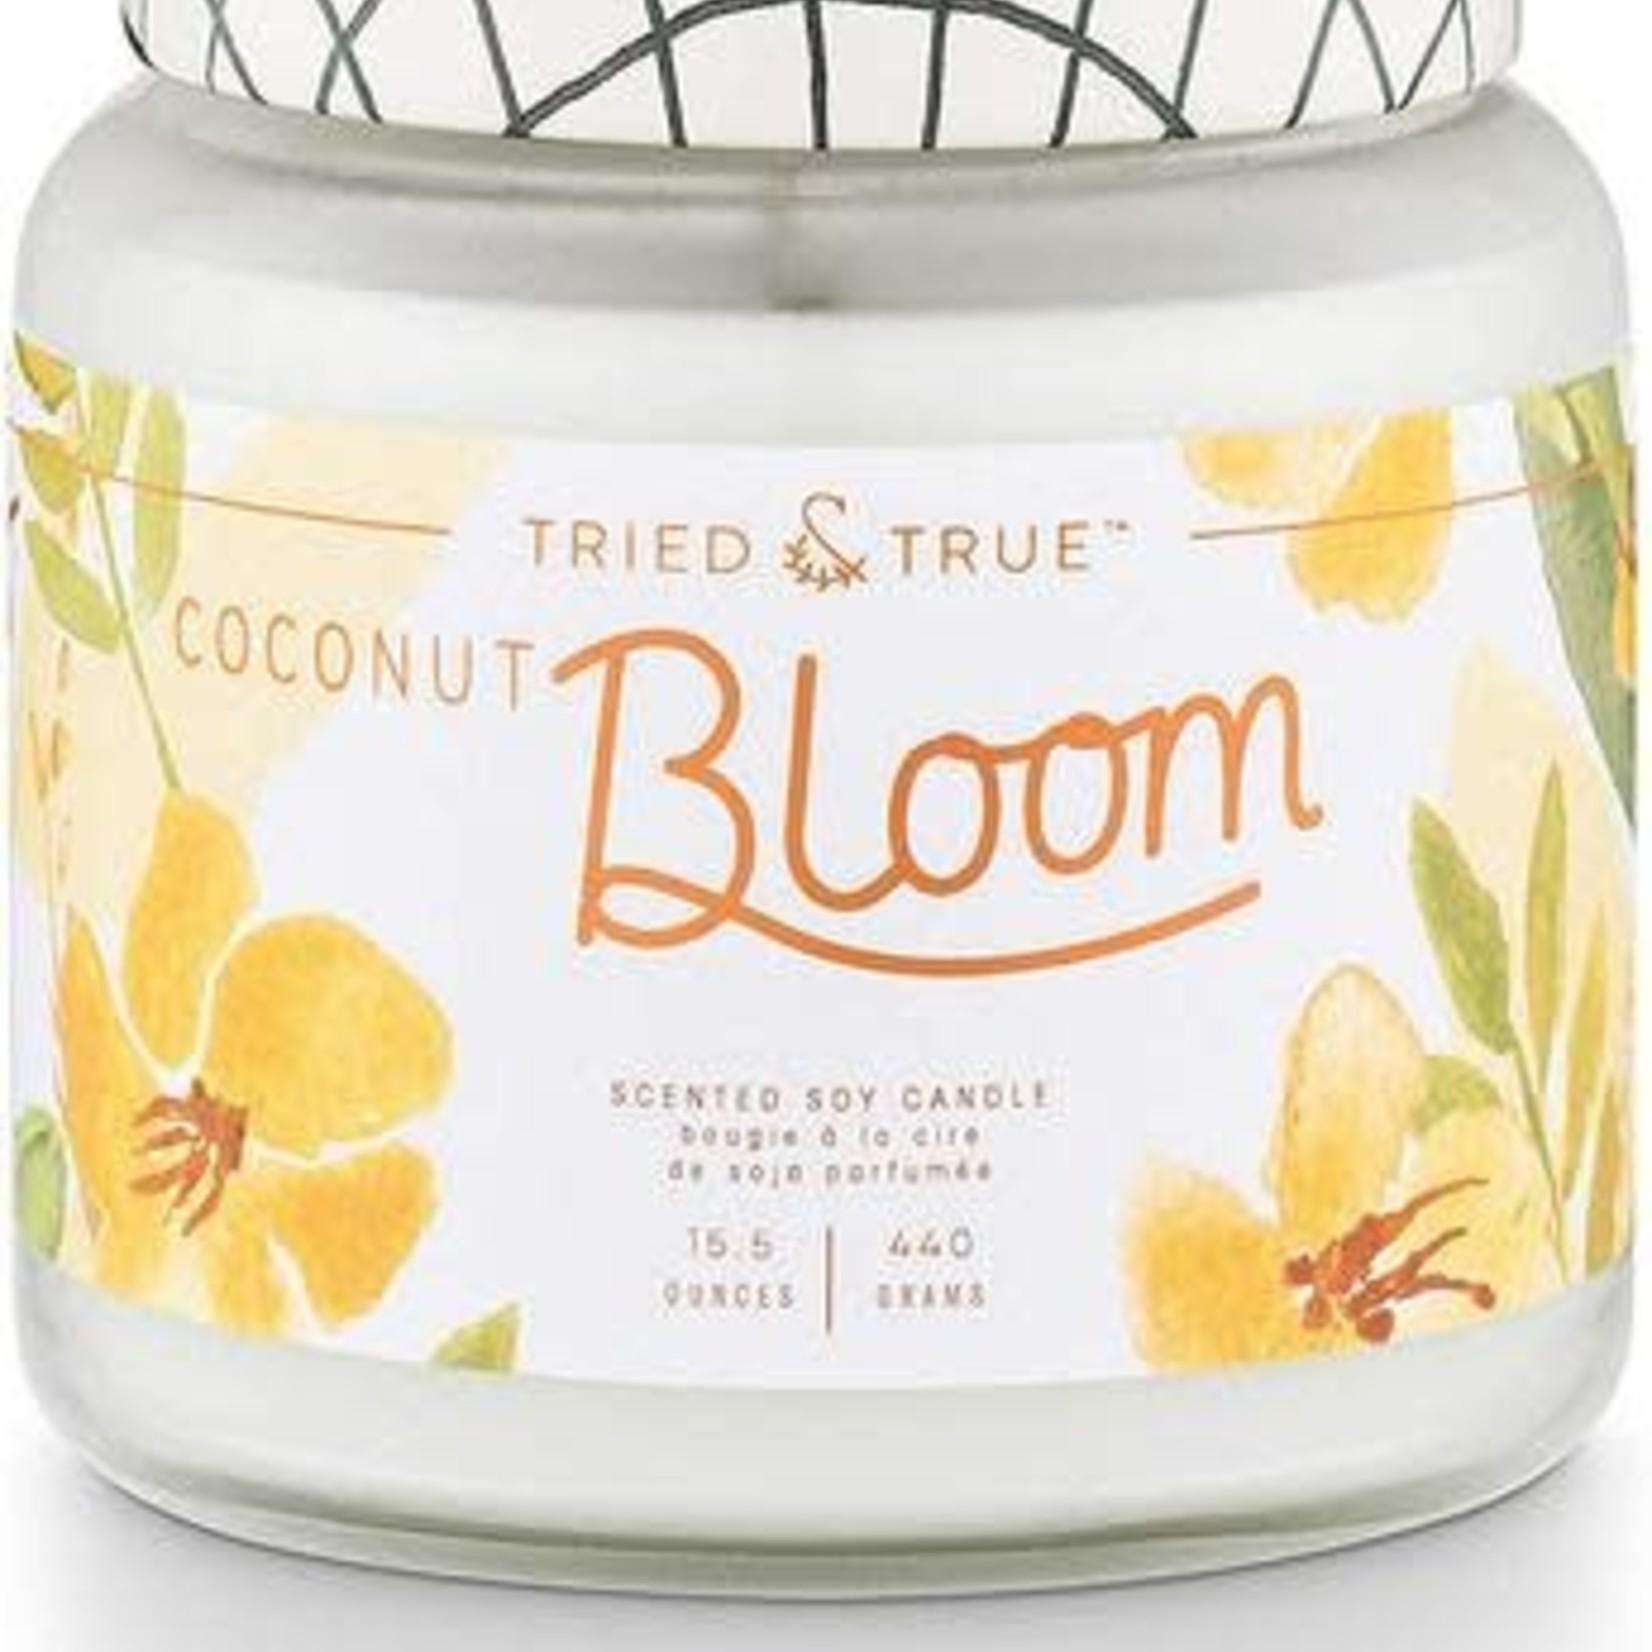 illume Tried & True Candle Large 15.5oz